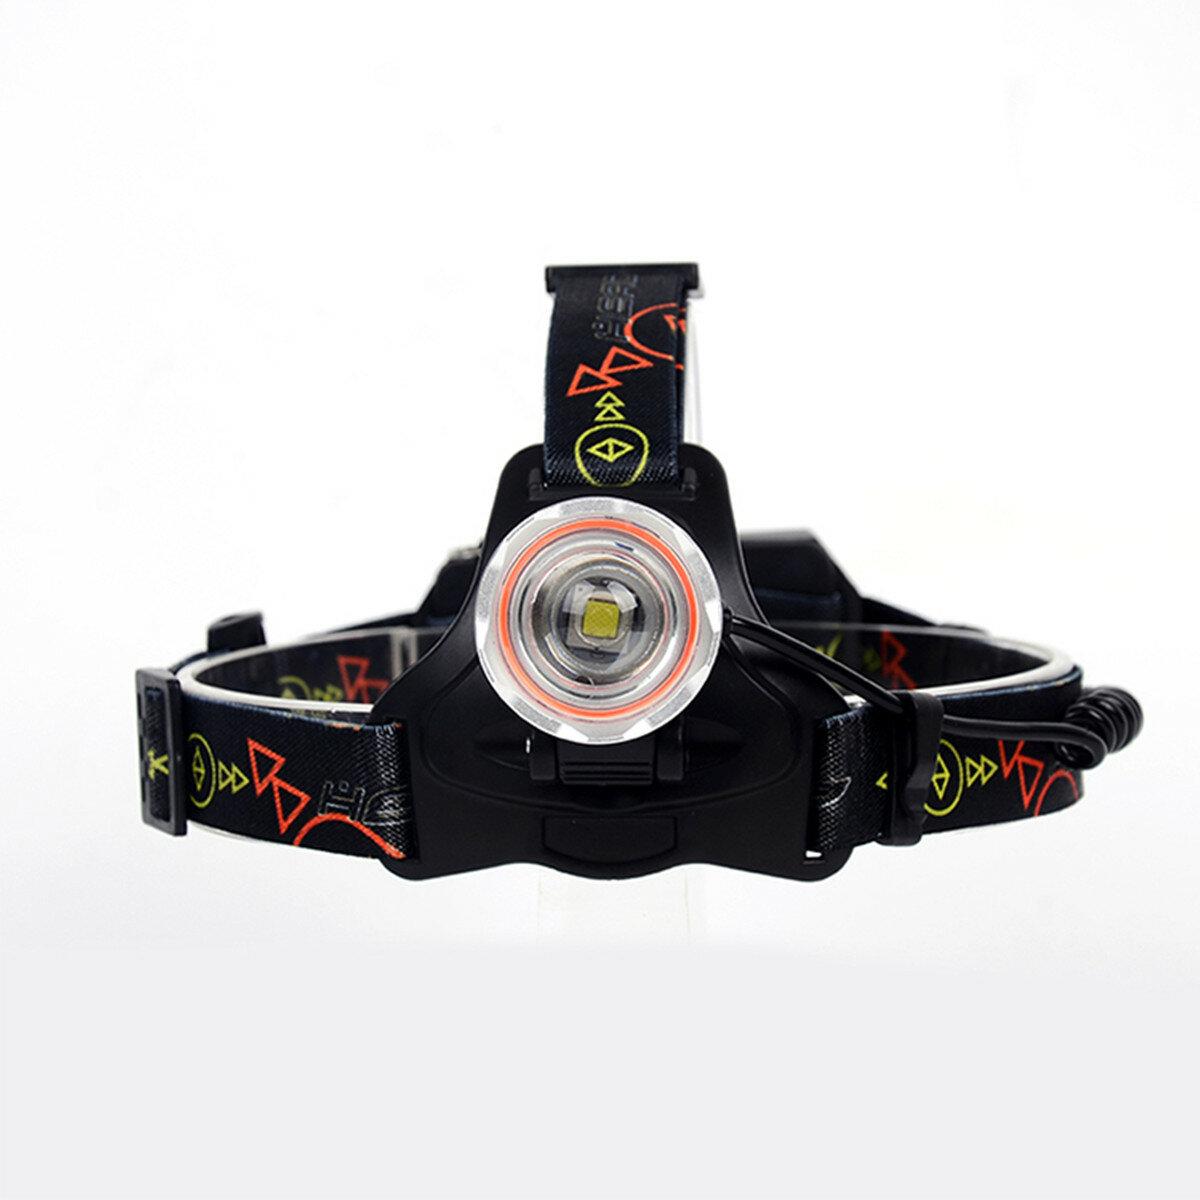 XANES® Mecánico Zoom 4-Modos L2 + COB LED Faros delanteros para ciclismo nocturno para cámping Caza Senderismo